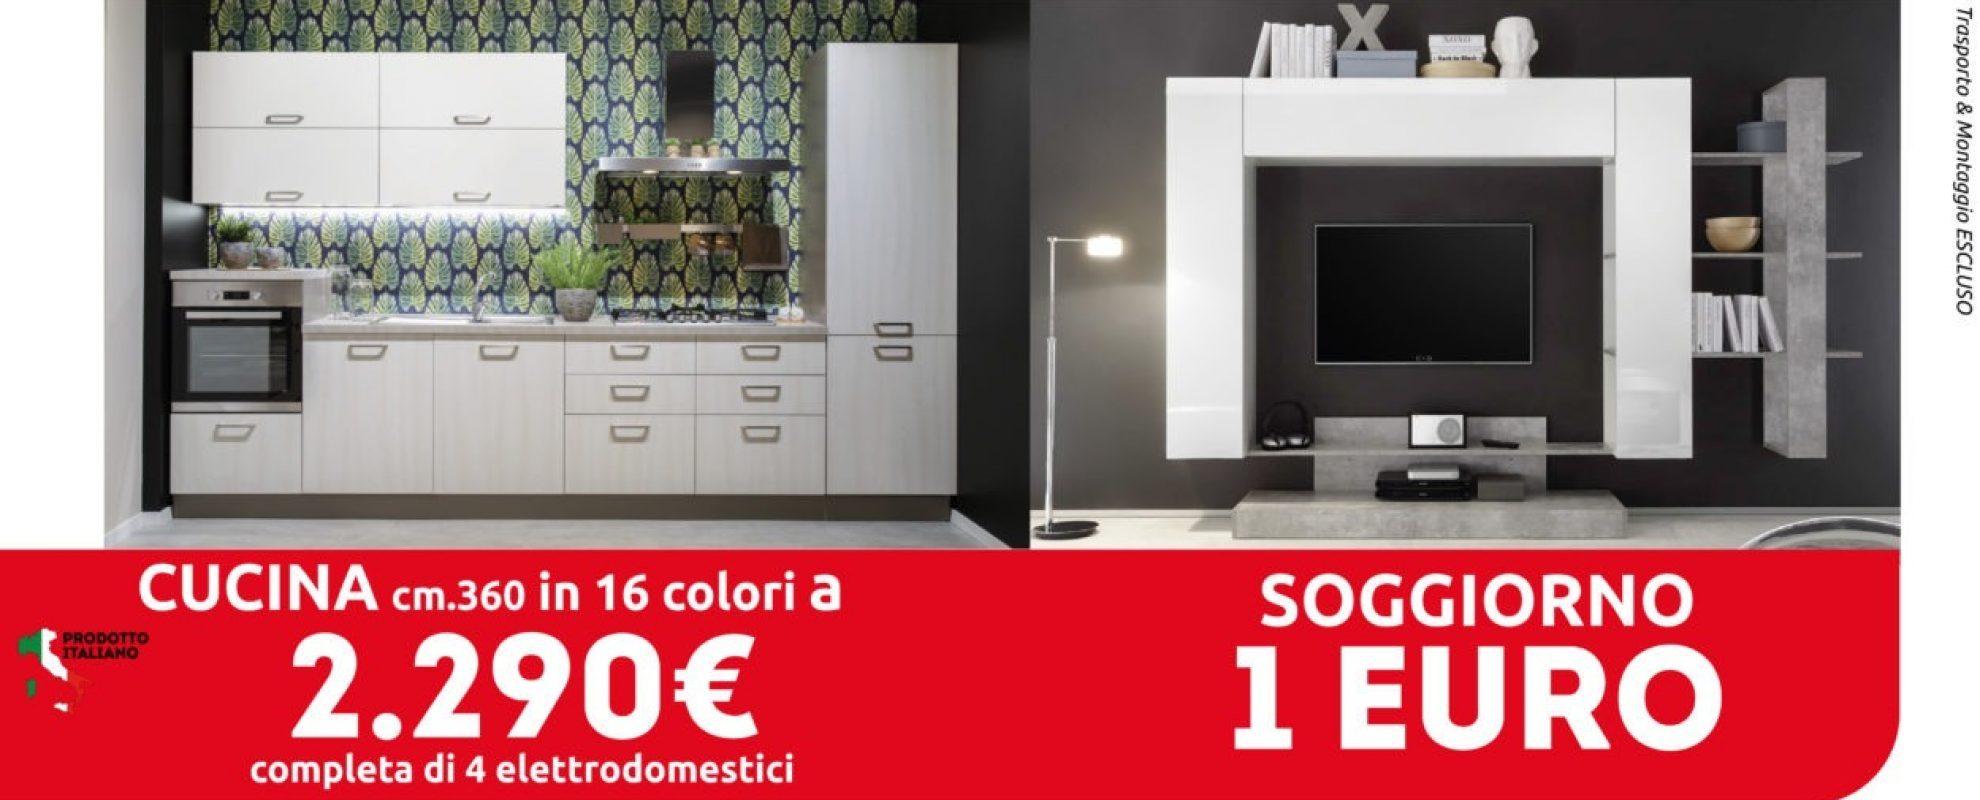 HomepagecucinaSOggiorno_Tavola-disegno-1-e1578303475119-okqdc39dk7mroh1ix390qoklcsrib9bo5ovbkrmvy8